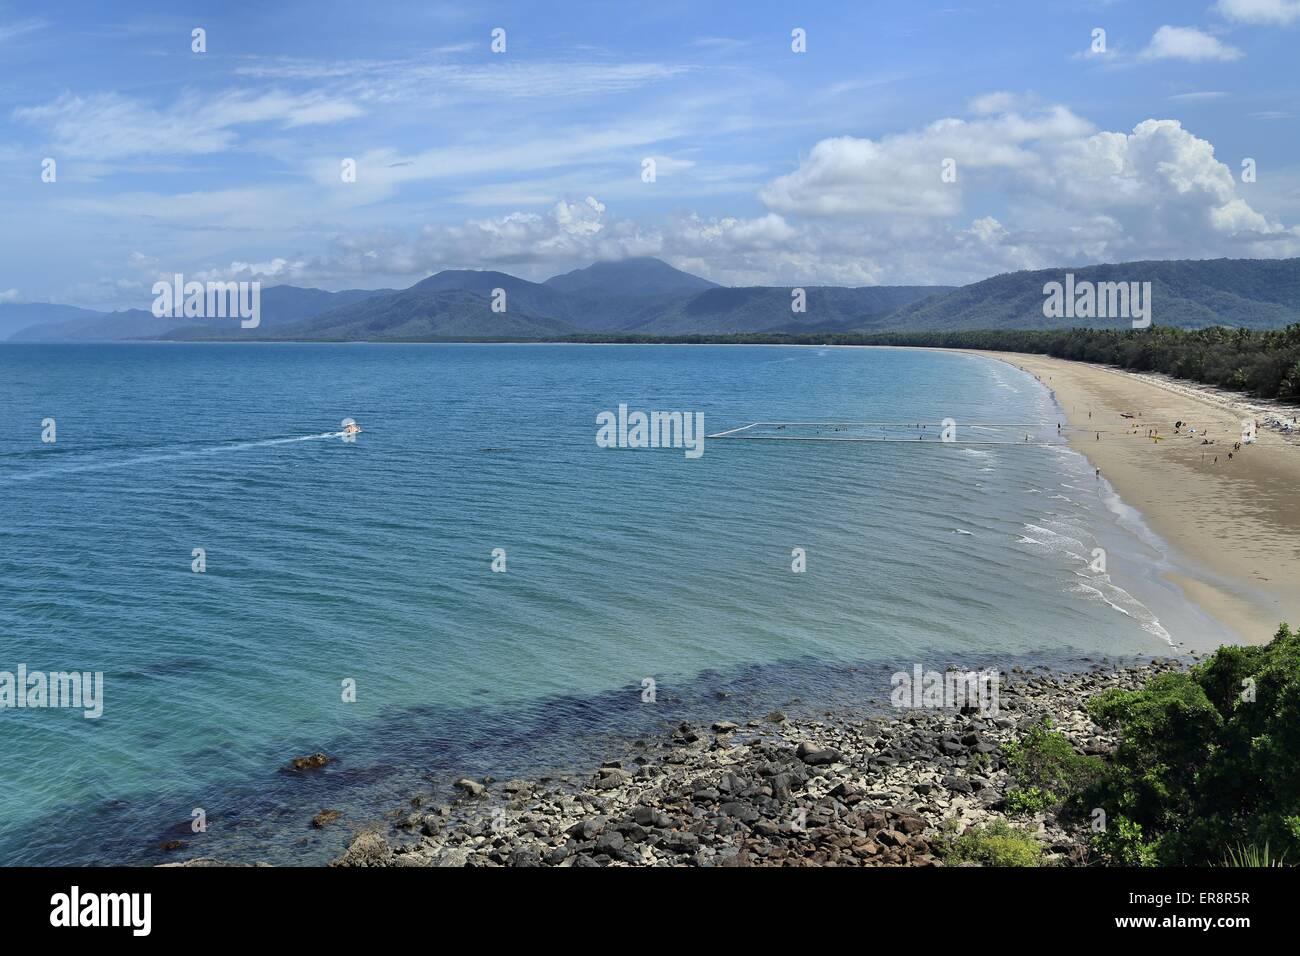 The beautiful sandy Four Mile Beach at Port Douglas, Queensland, Australia - Stock Image